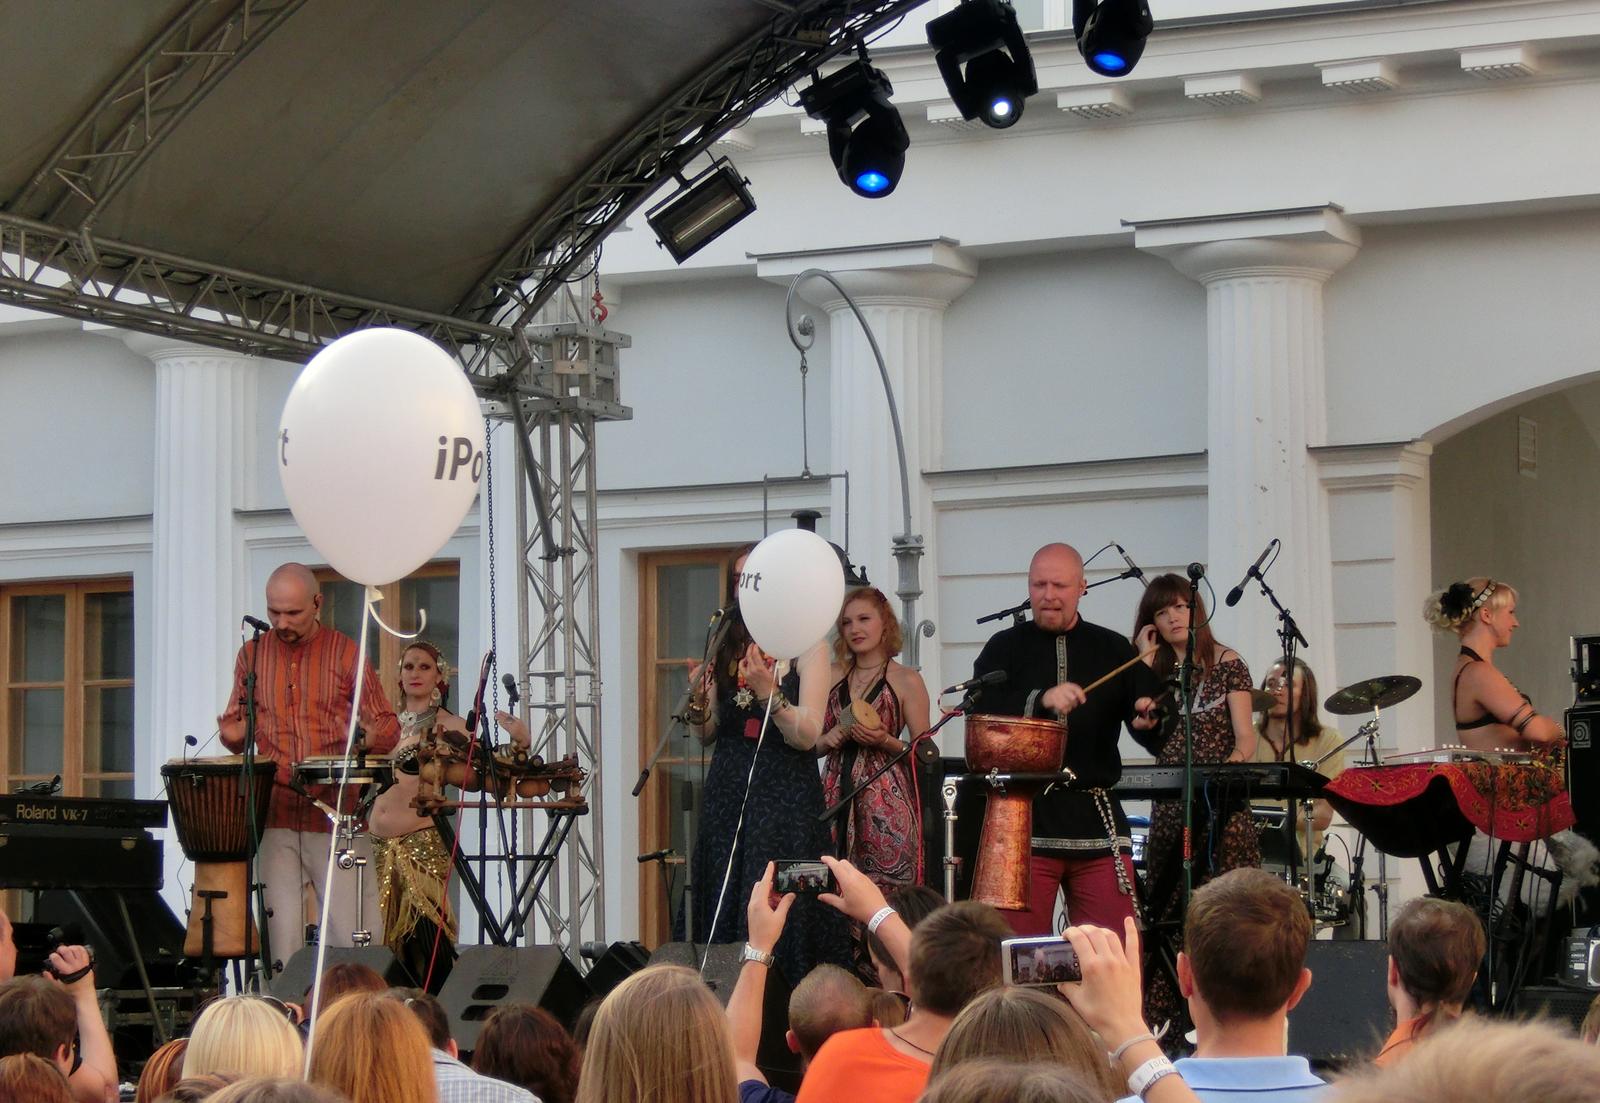 Theodor Bastard, Stereoleto, 2013, St.Petersburg